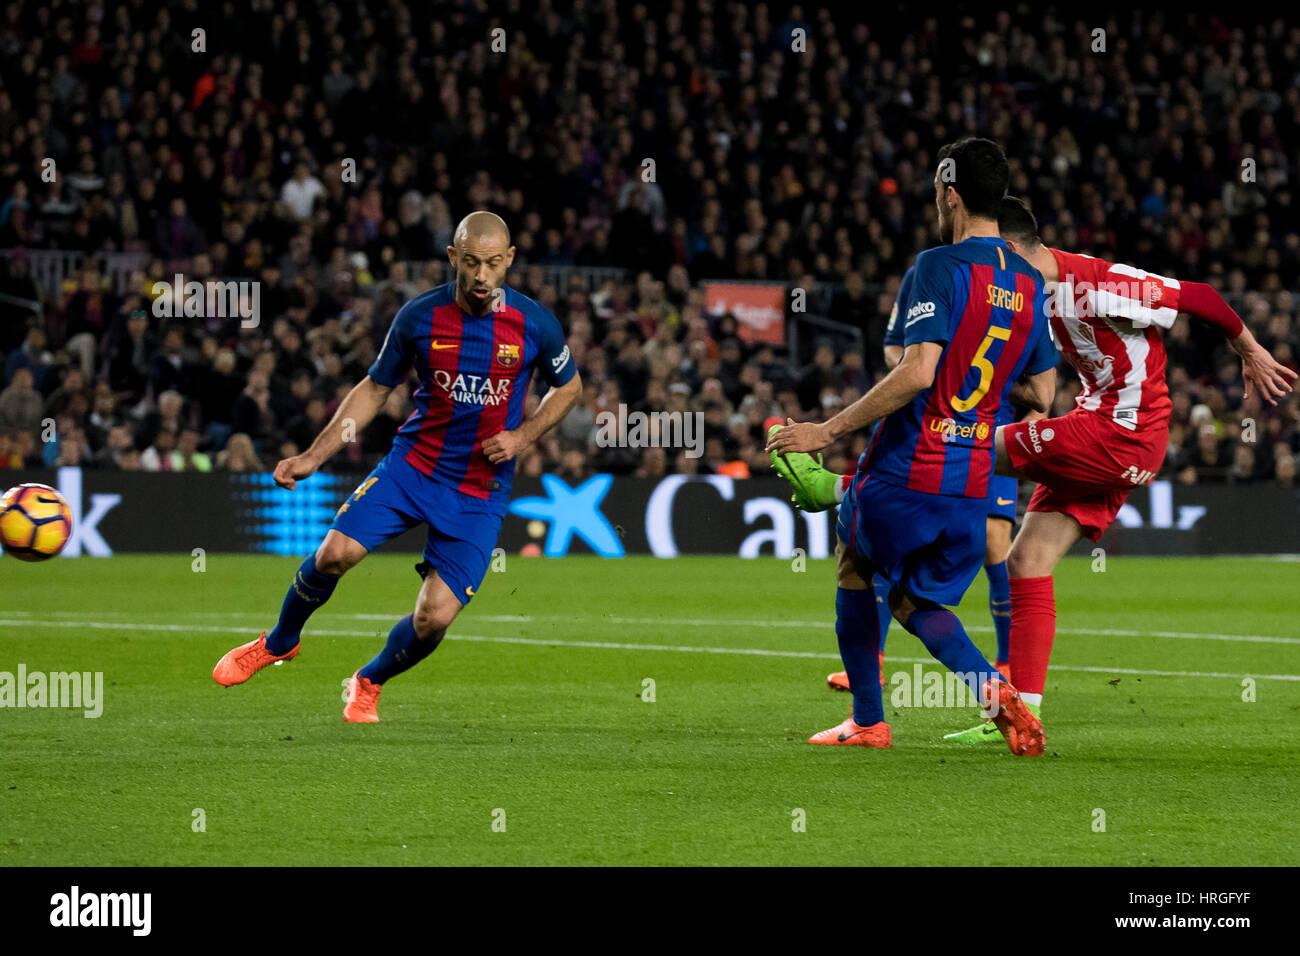 Camp Not Stadium, Barcelona, Spain. 1st March, 2017. Kick goal of Burgui at Camp Nou Stadium, Barcelona, Spain. - Stock Image